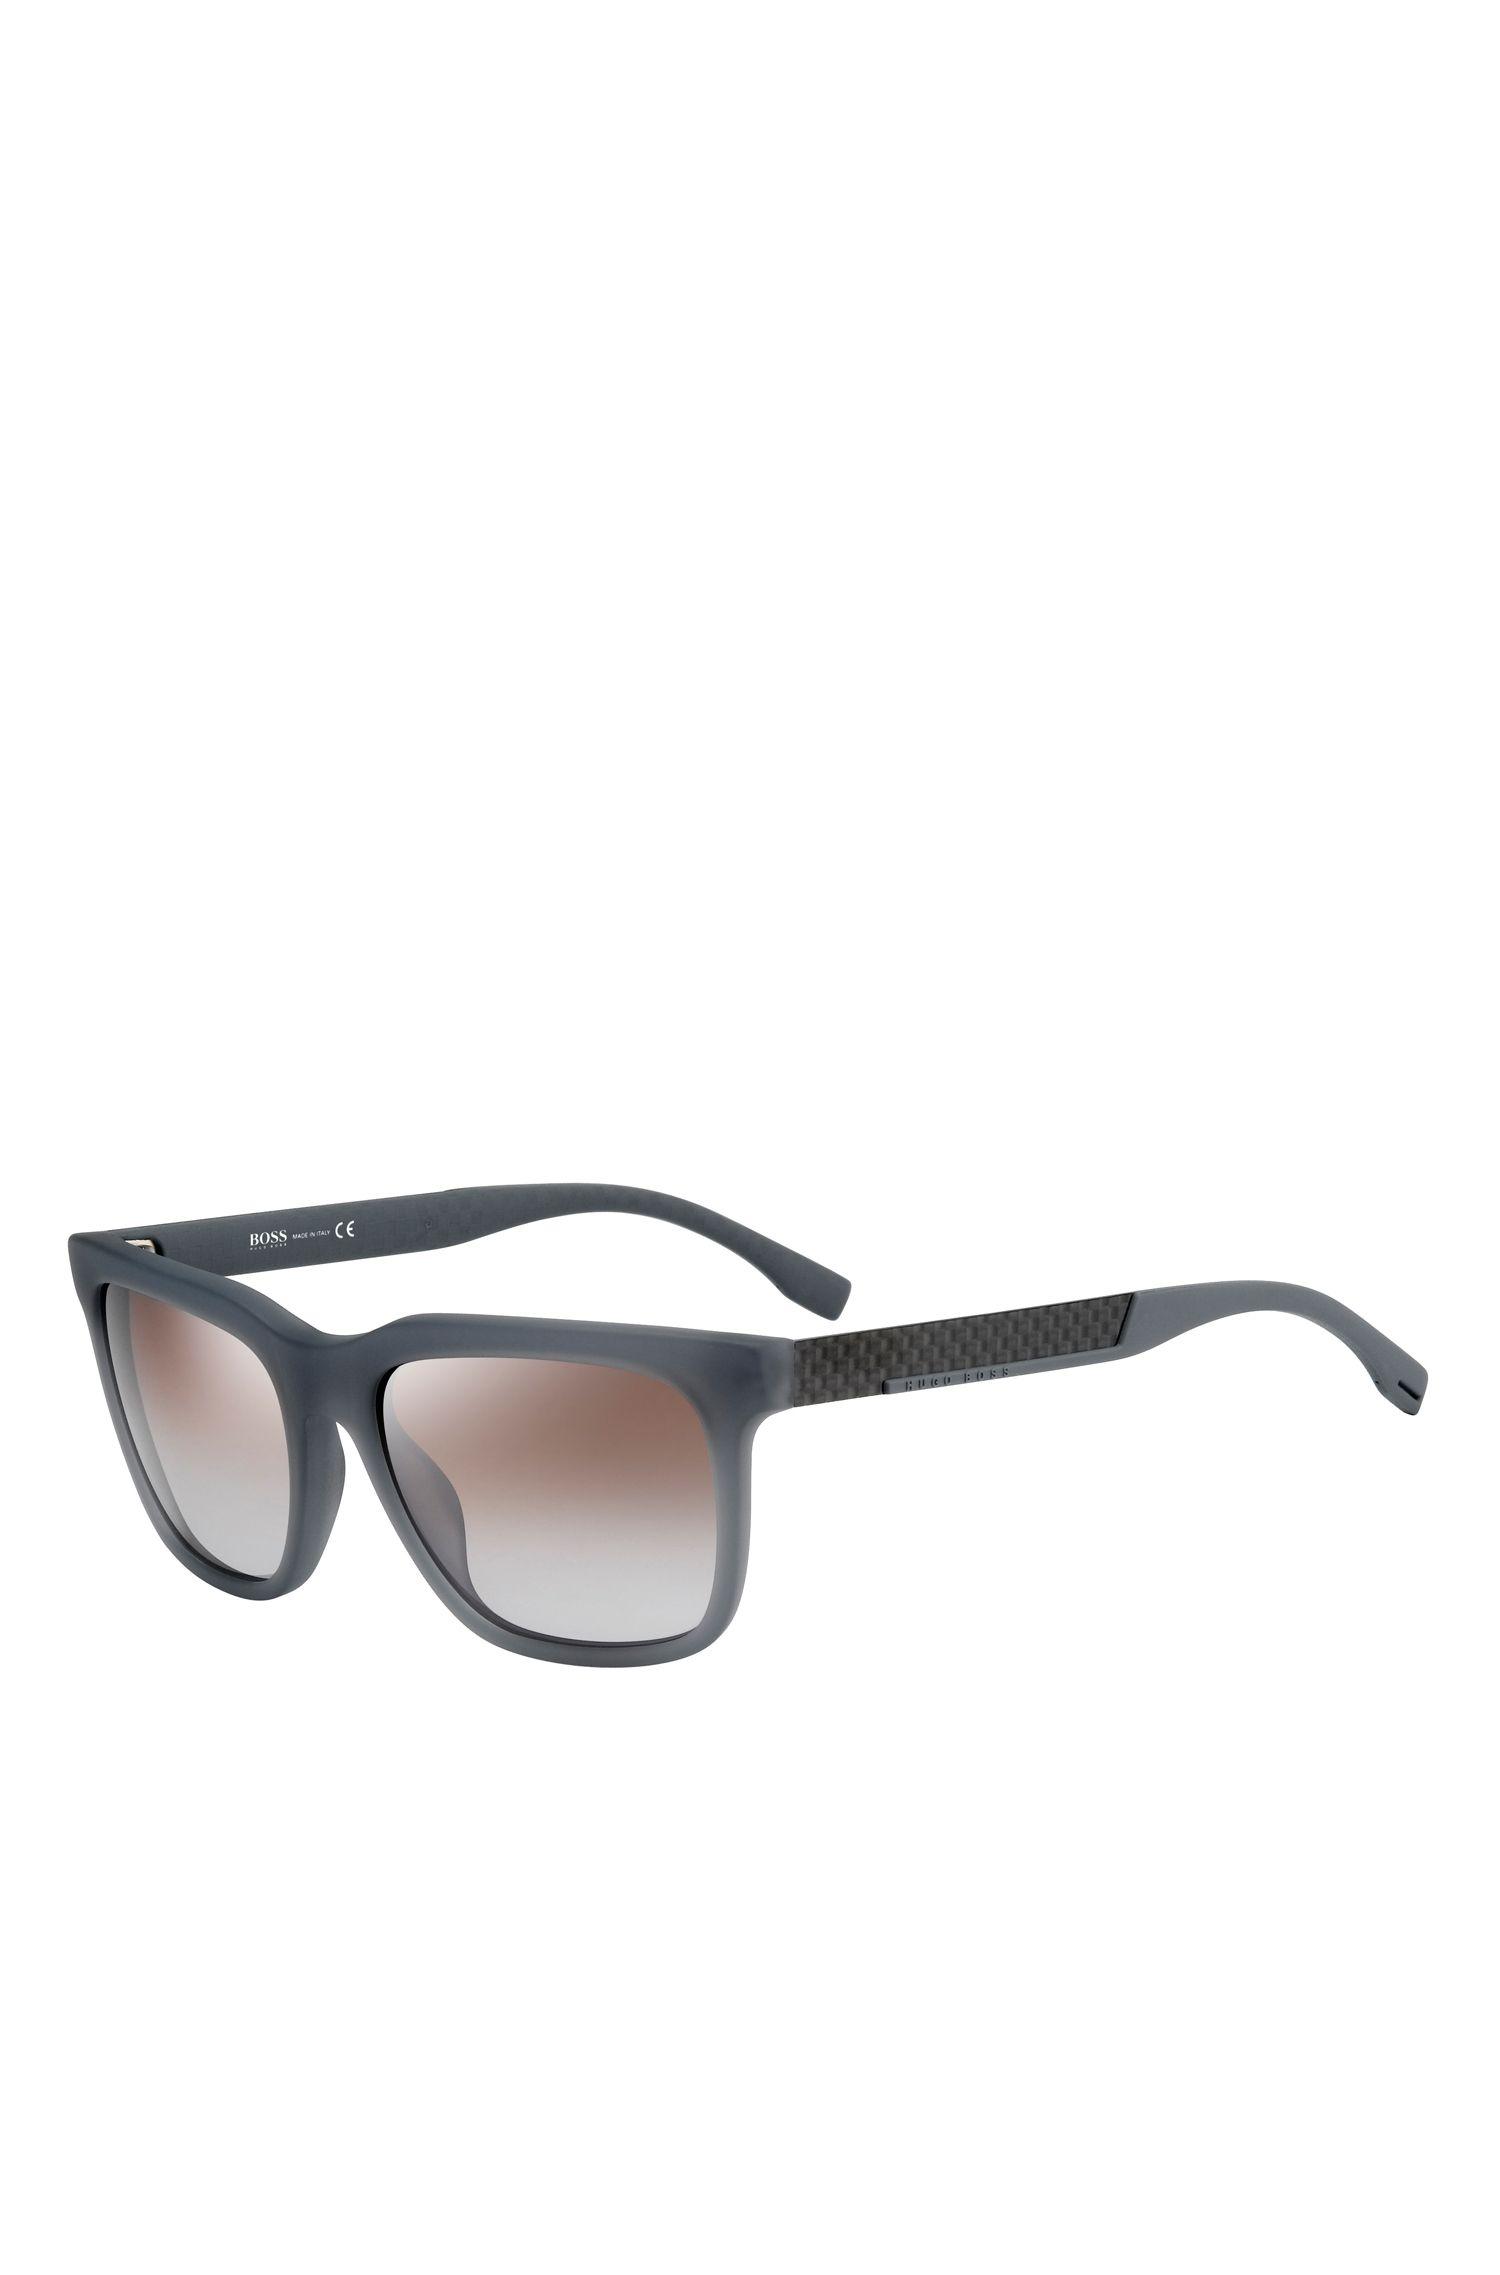 Gradient Lens Rectangular Sunglasses | BOSS 0670S, Assorted-Pre-Pack